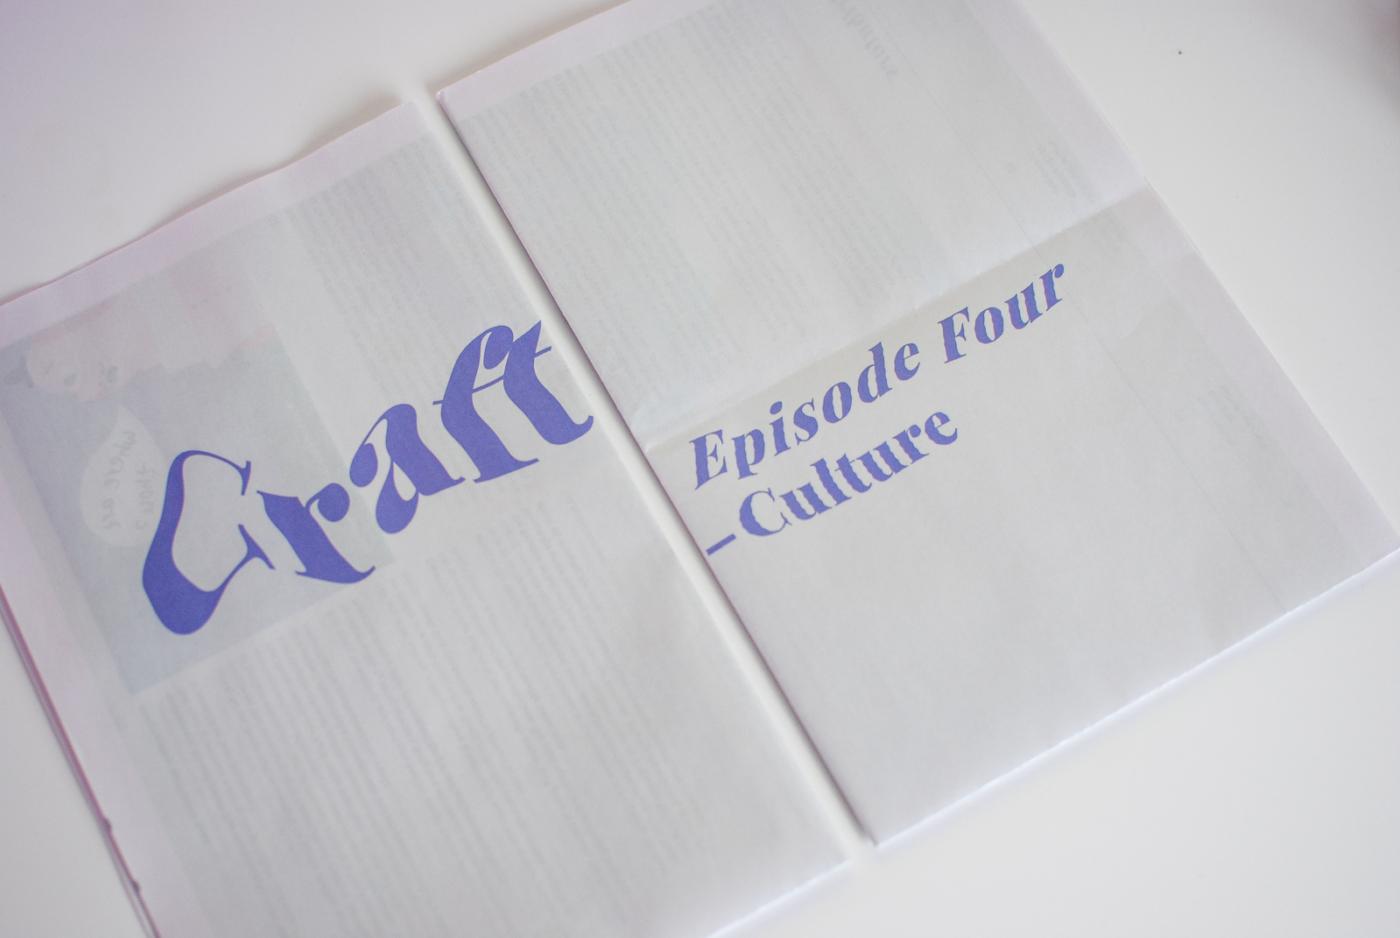 Design culture 1